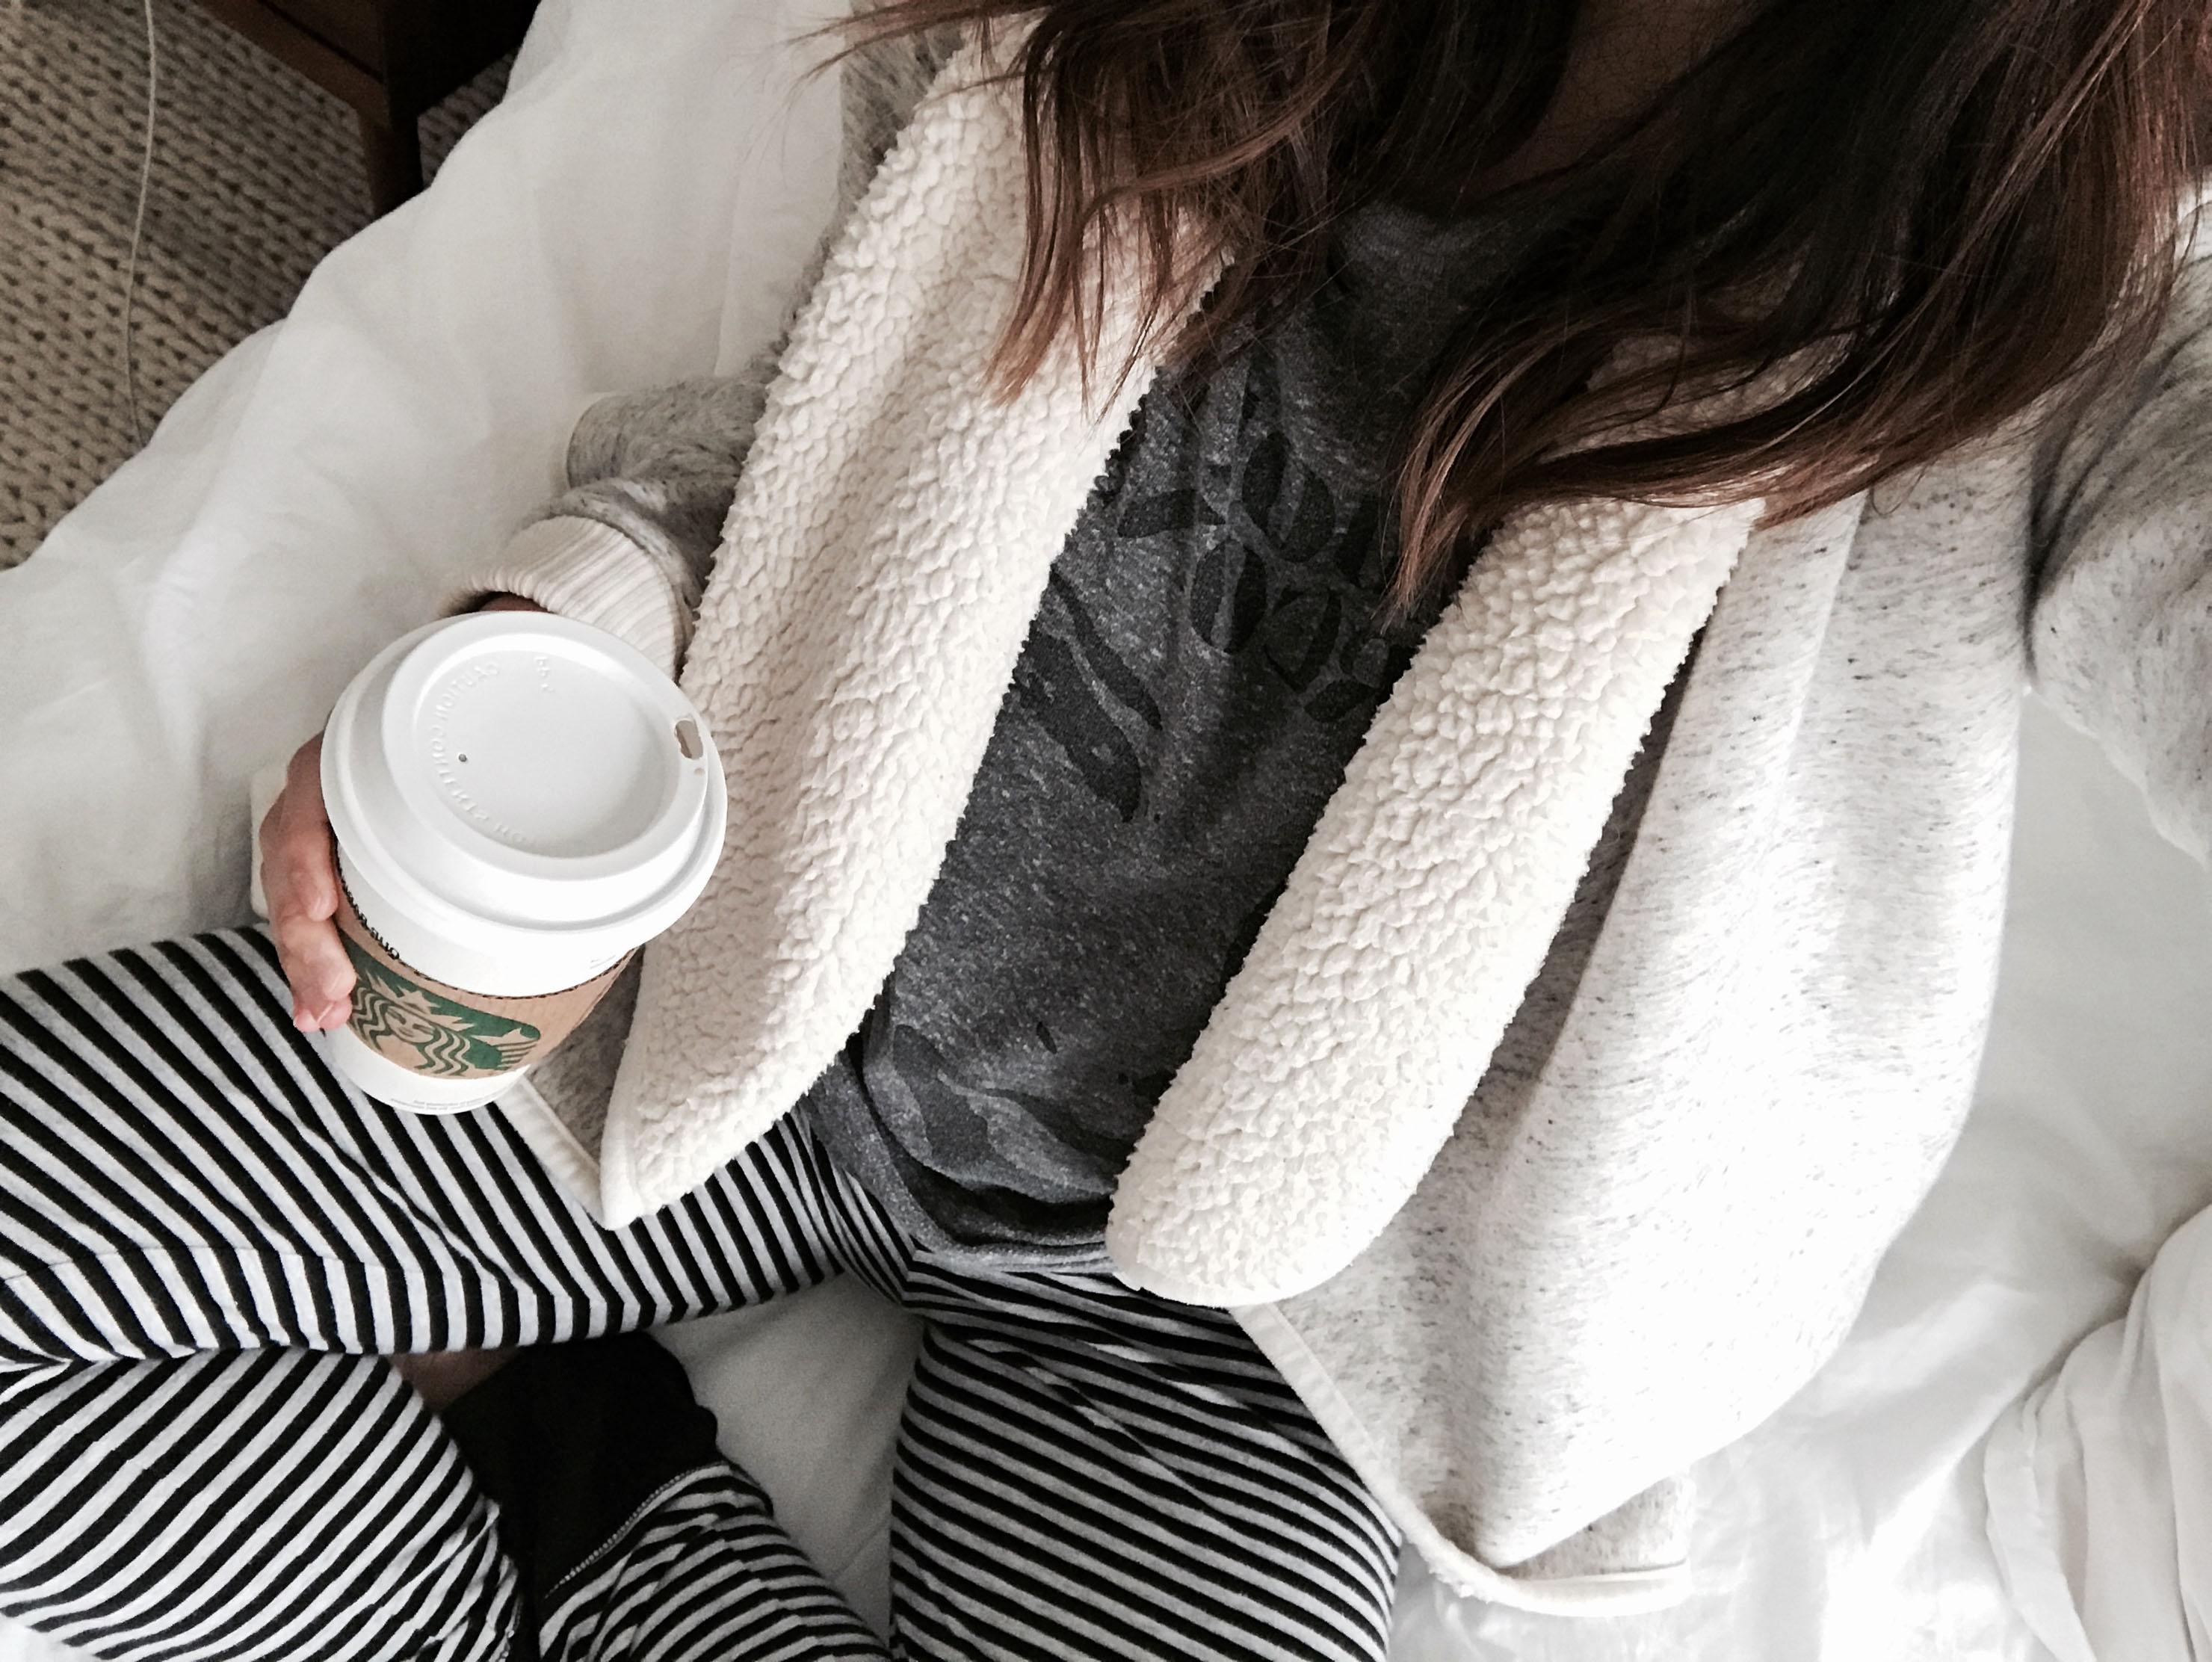 Abercrombie & Fitch fleece cardigan